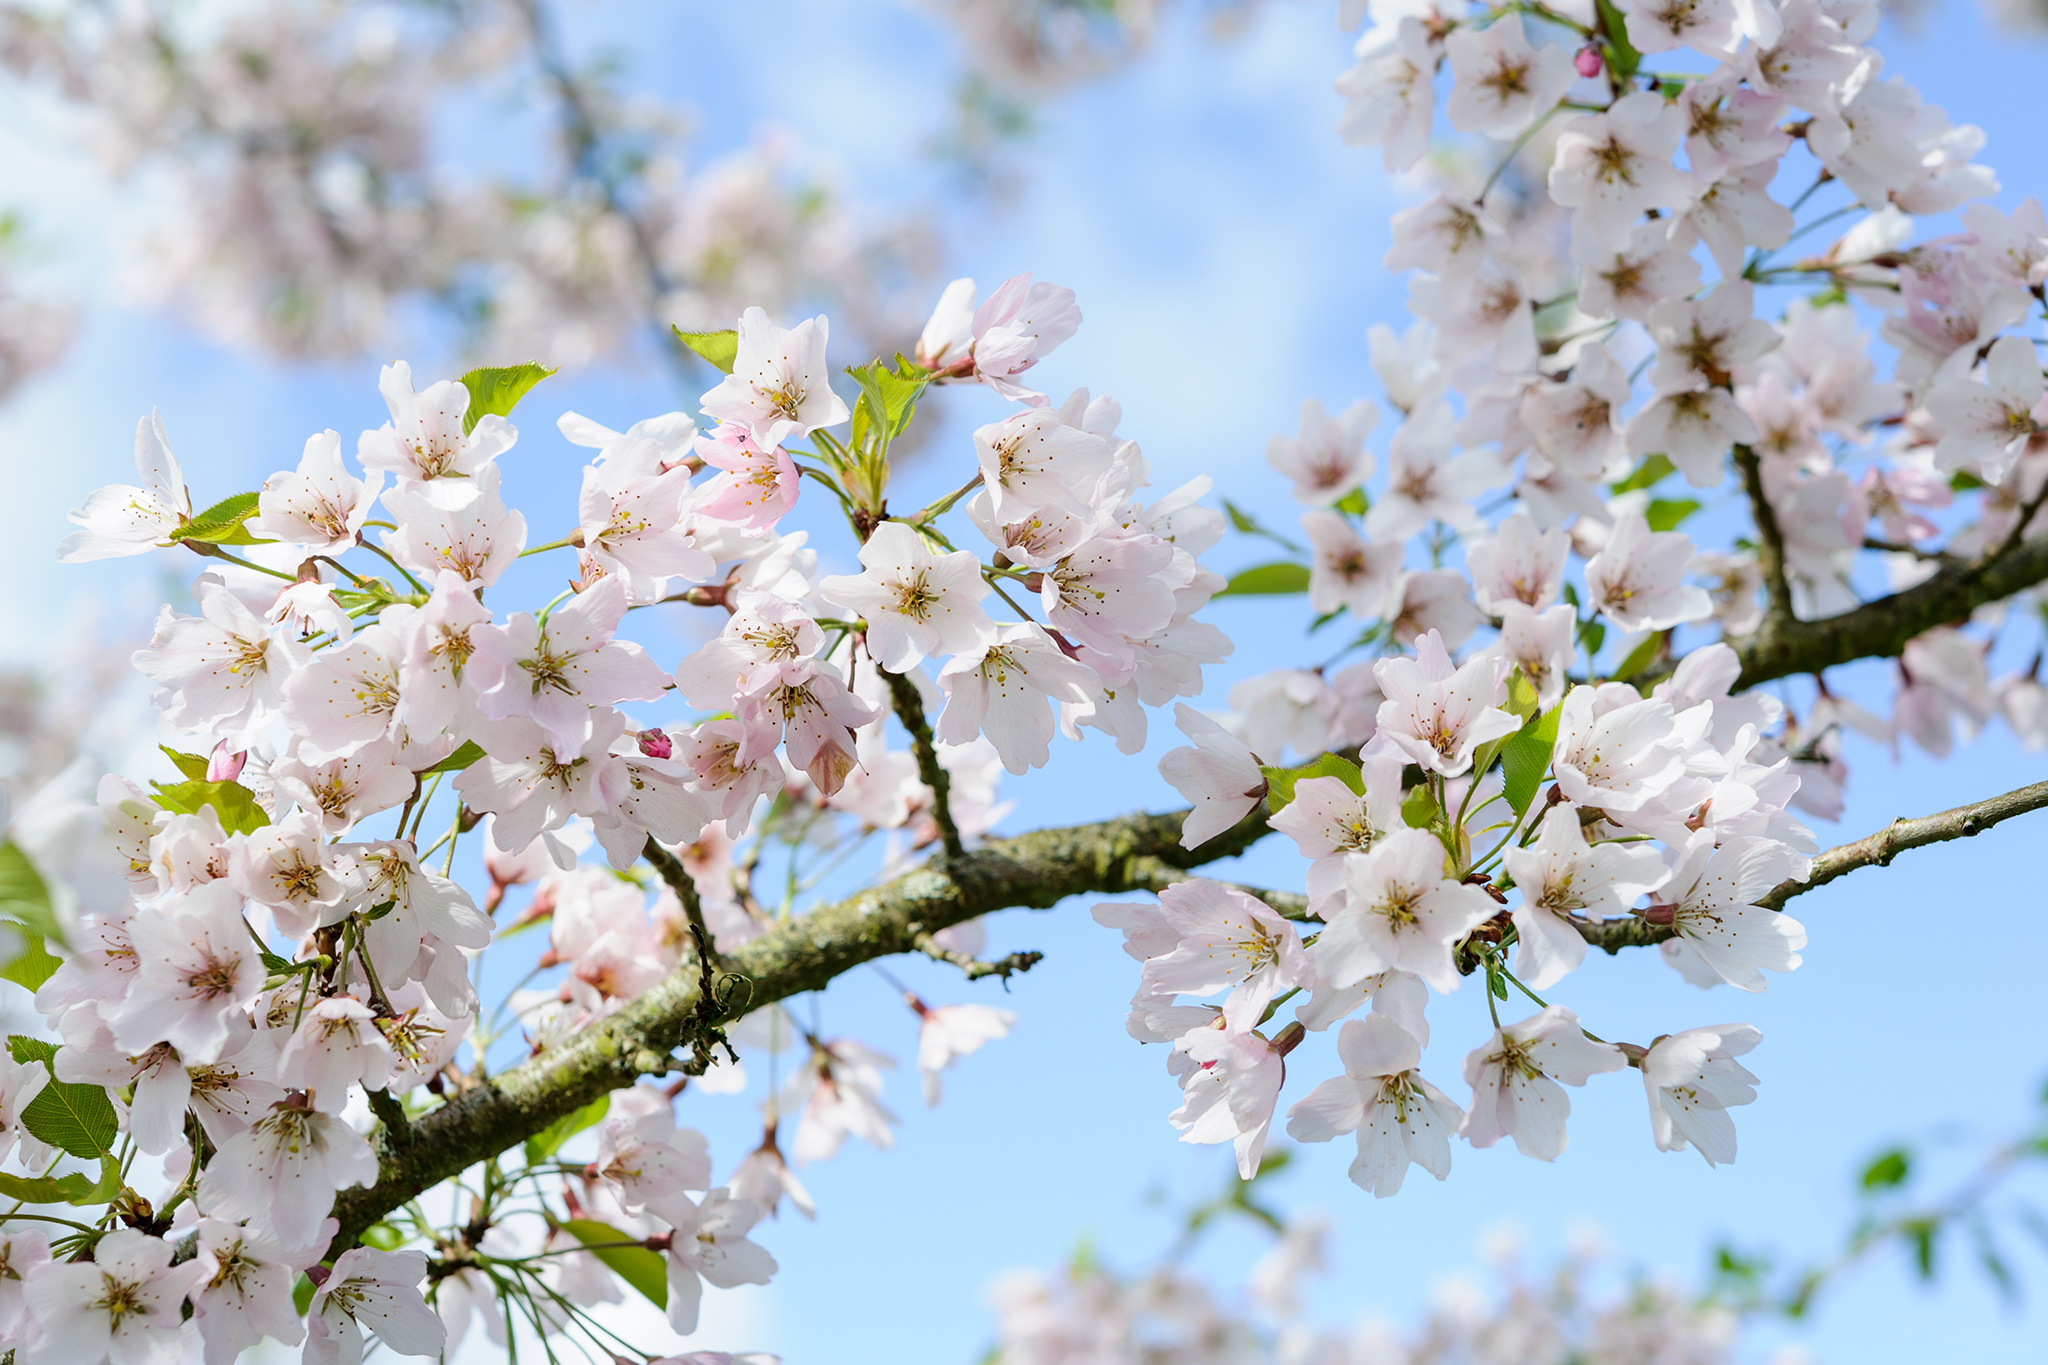 10 trees with beautiful spring blossom gardenersworld prunus pink shell 3 mightylinksfo